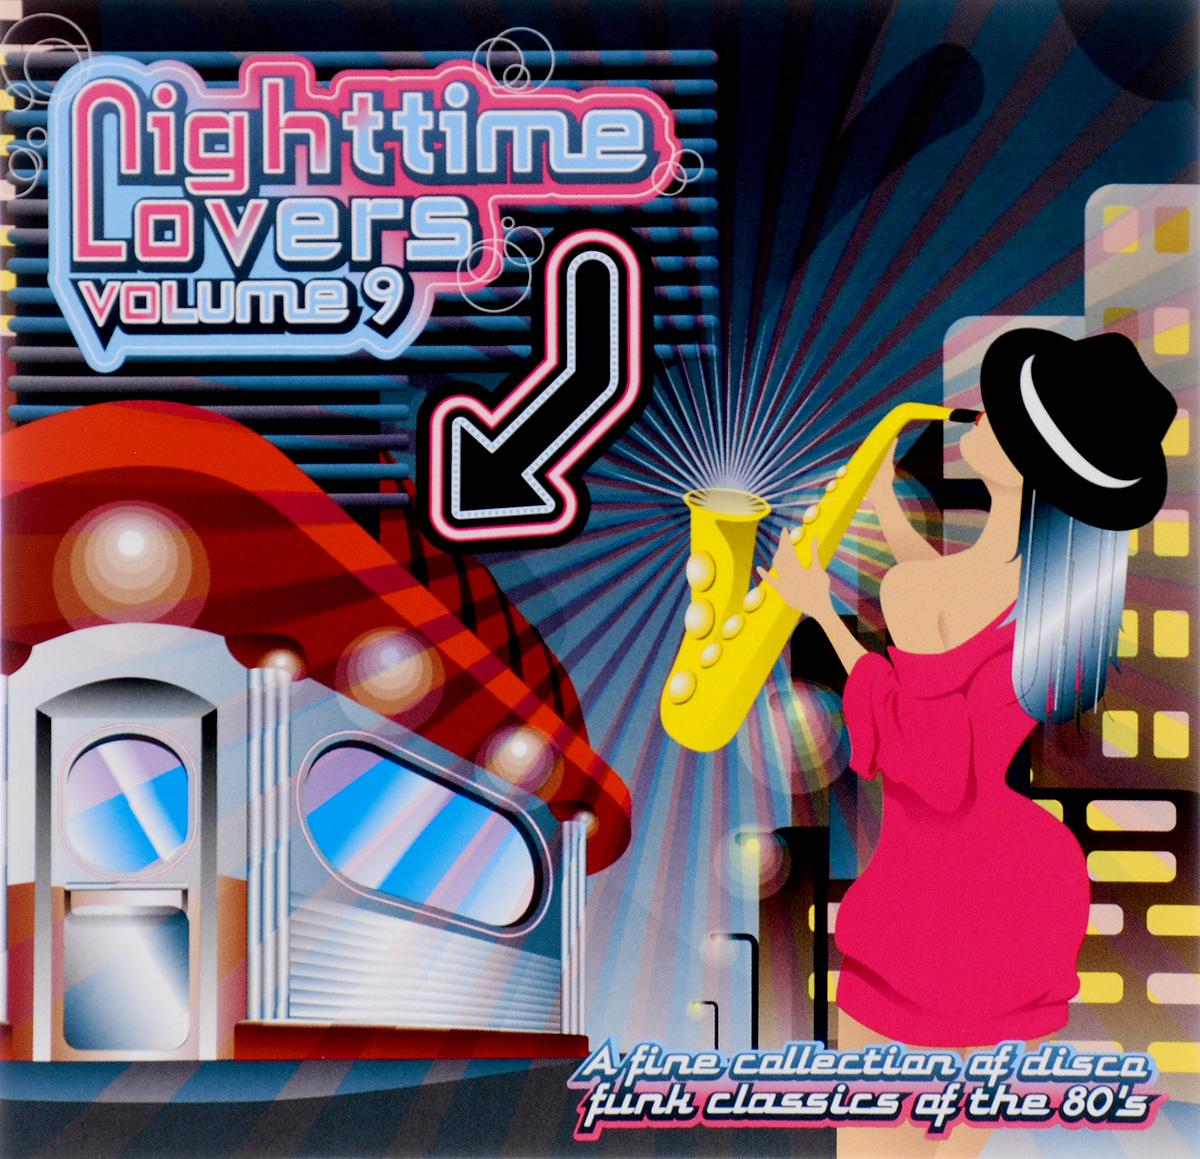 """Funk Deluxe"",""Heaven And Earth"",Michael Lovesmith,""Zushii"",""Private Joy"",Bernice Watkins,Jazzy Dee,Xavier,Alfie Silas,""Futura"" Nighttime Lovers. Volume 9"